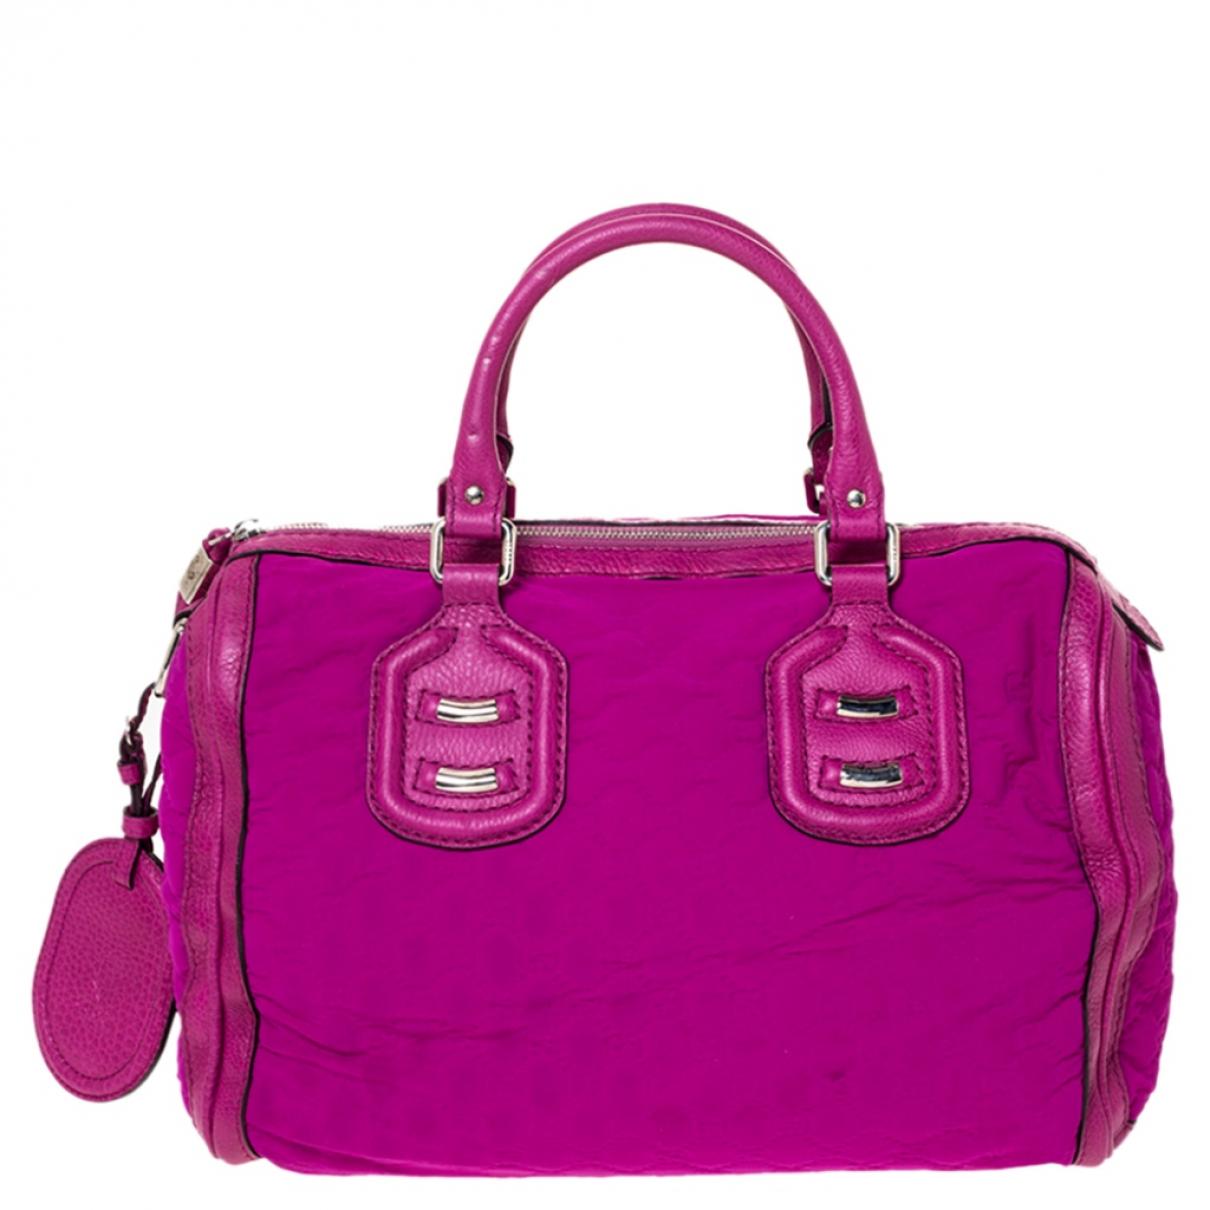 Gucci Boston Leather handbag for Women N